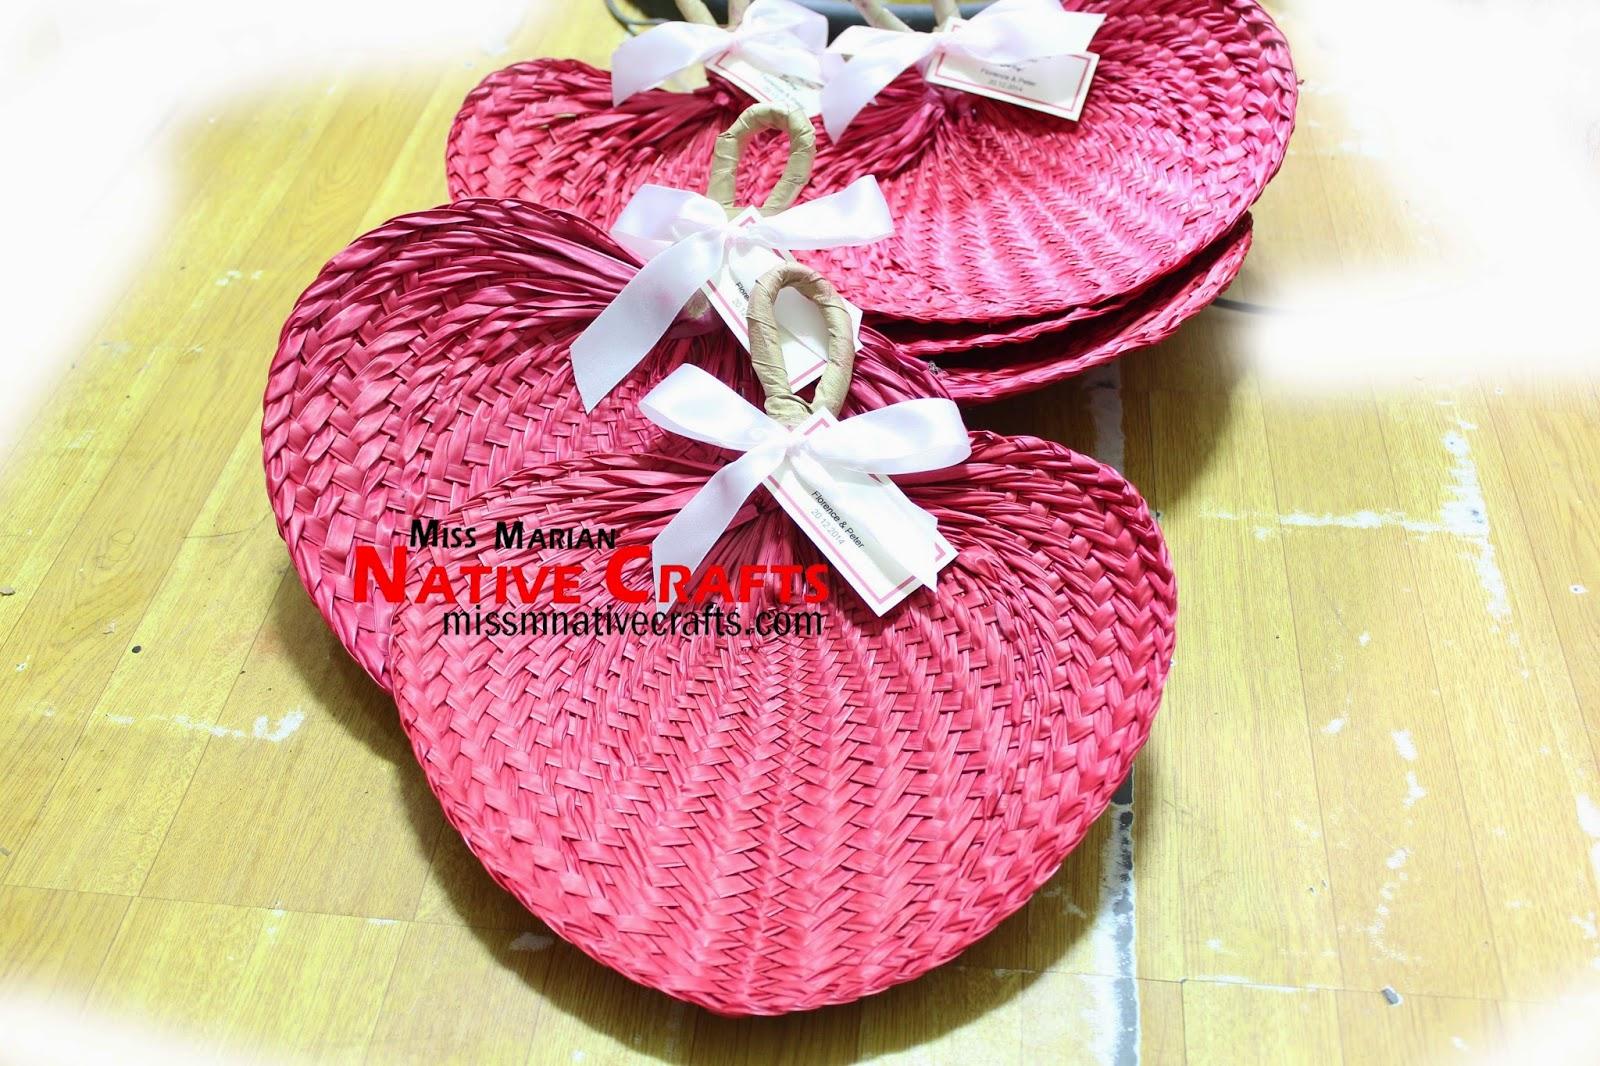 Miss Marian Native Crafts